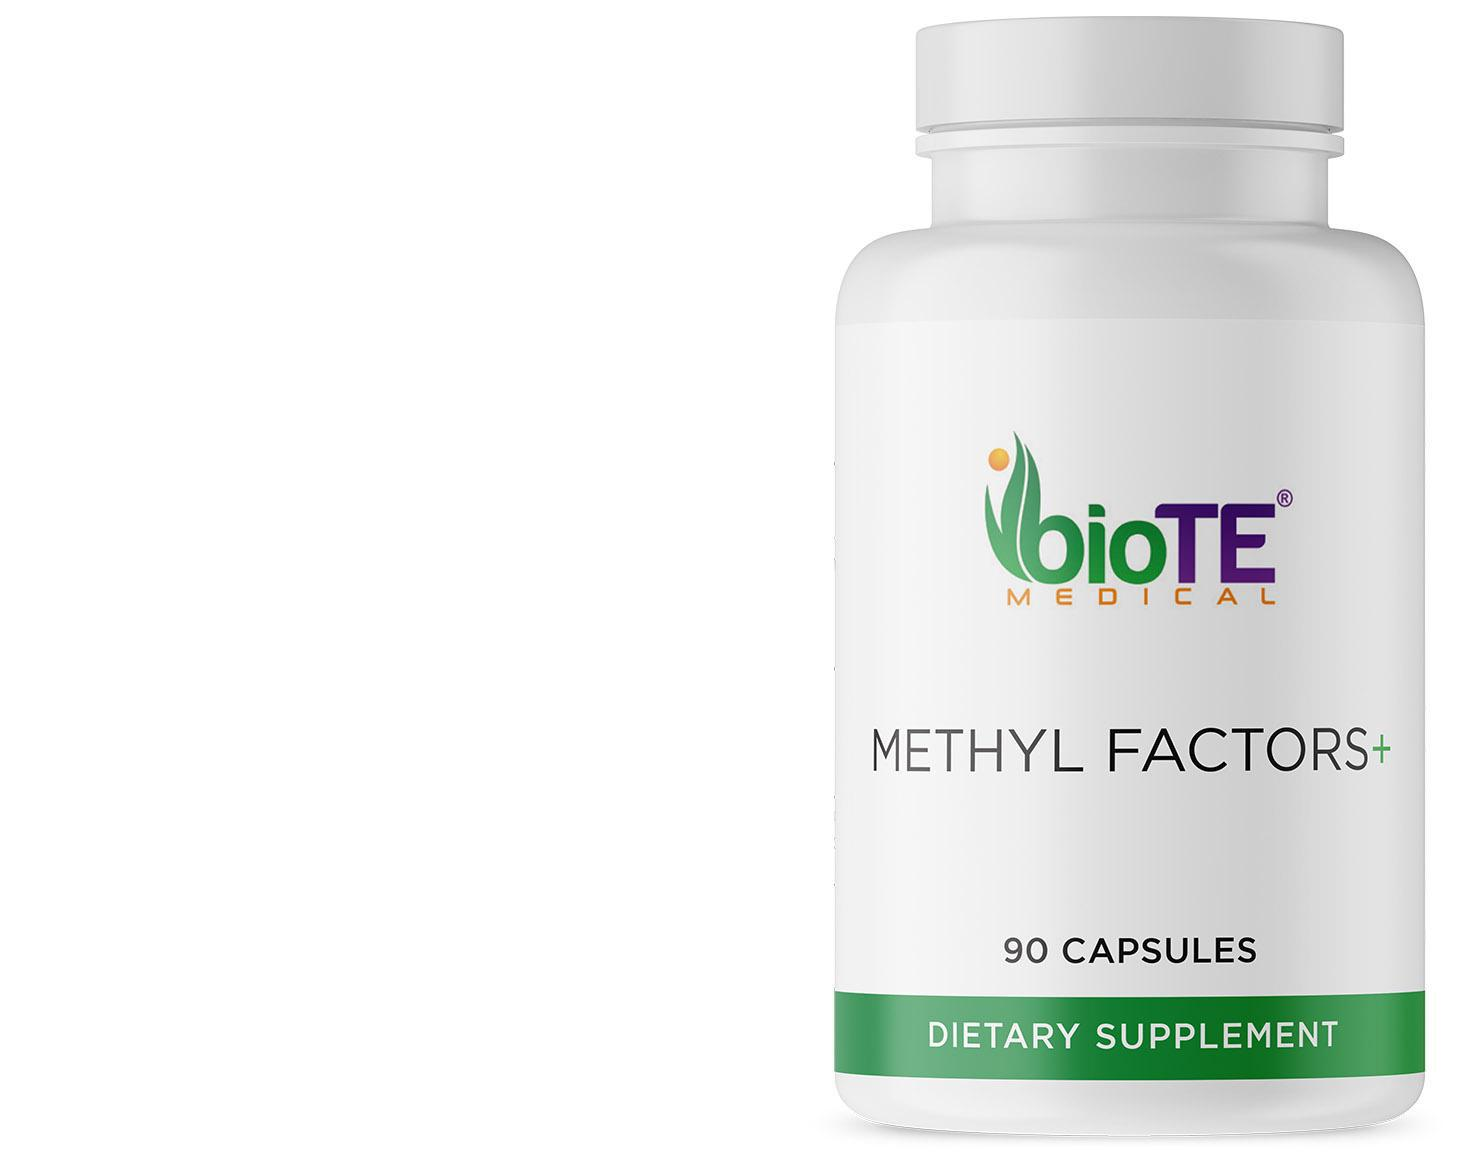 Methyl factors+